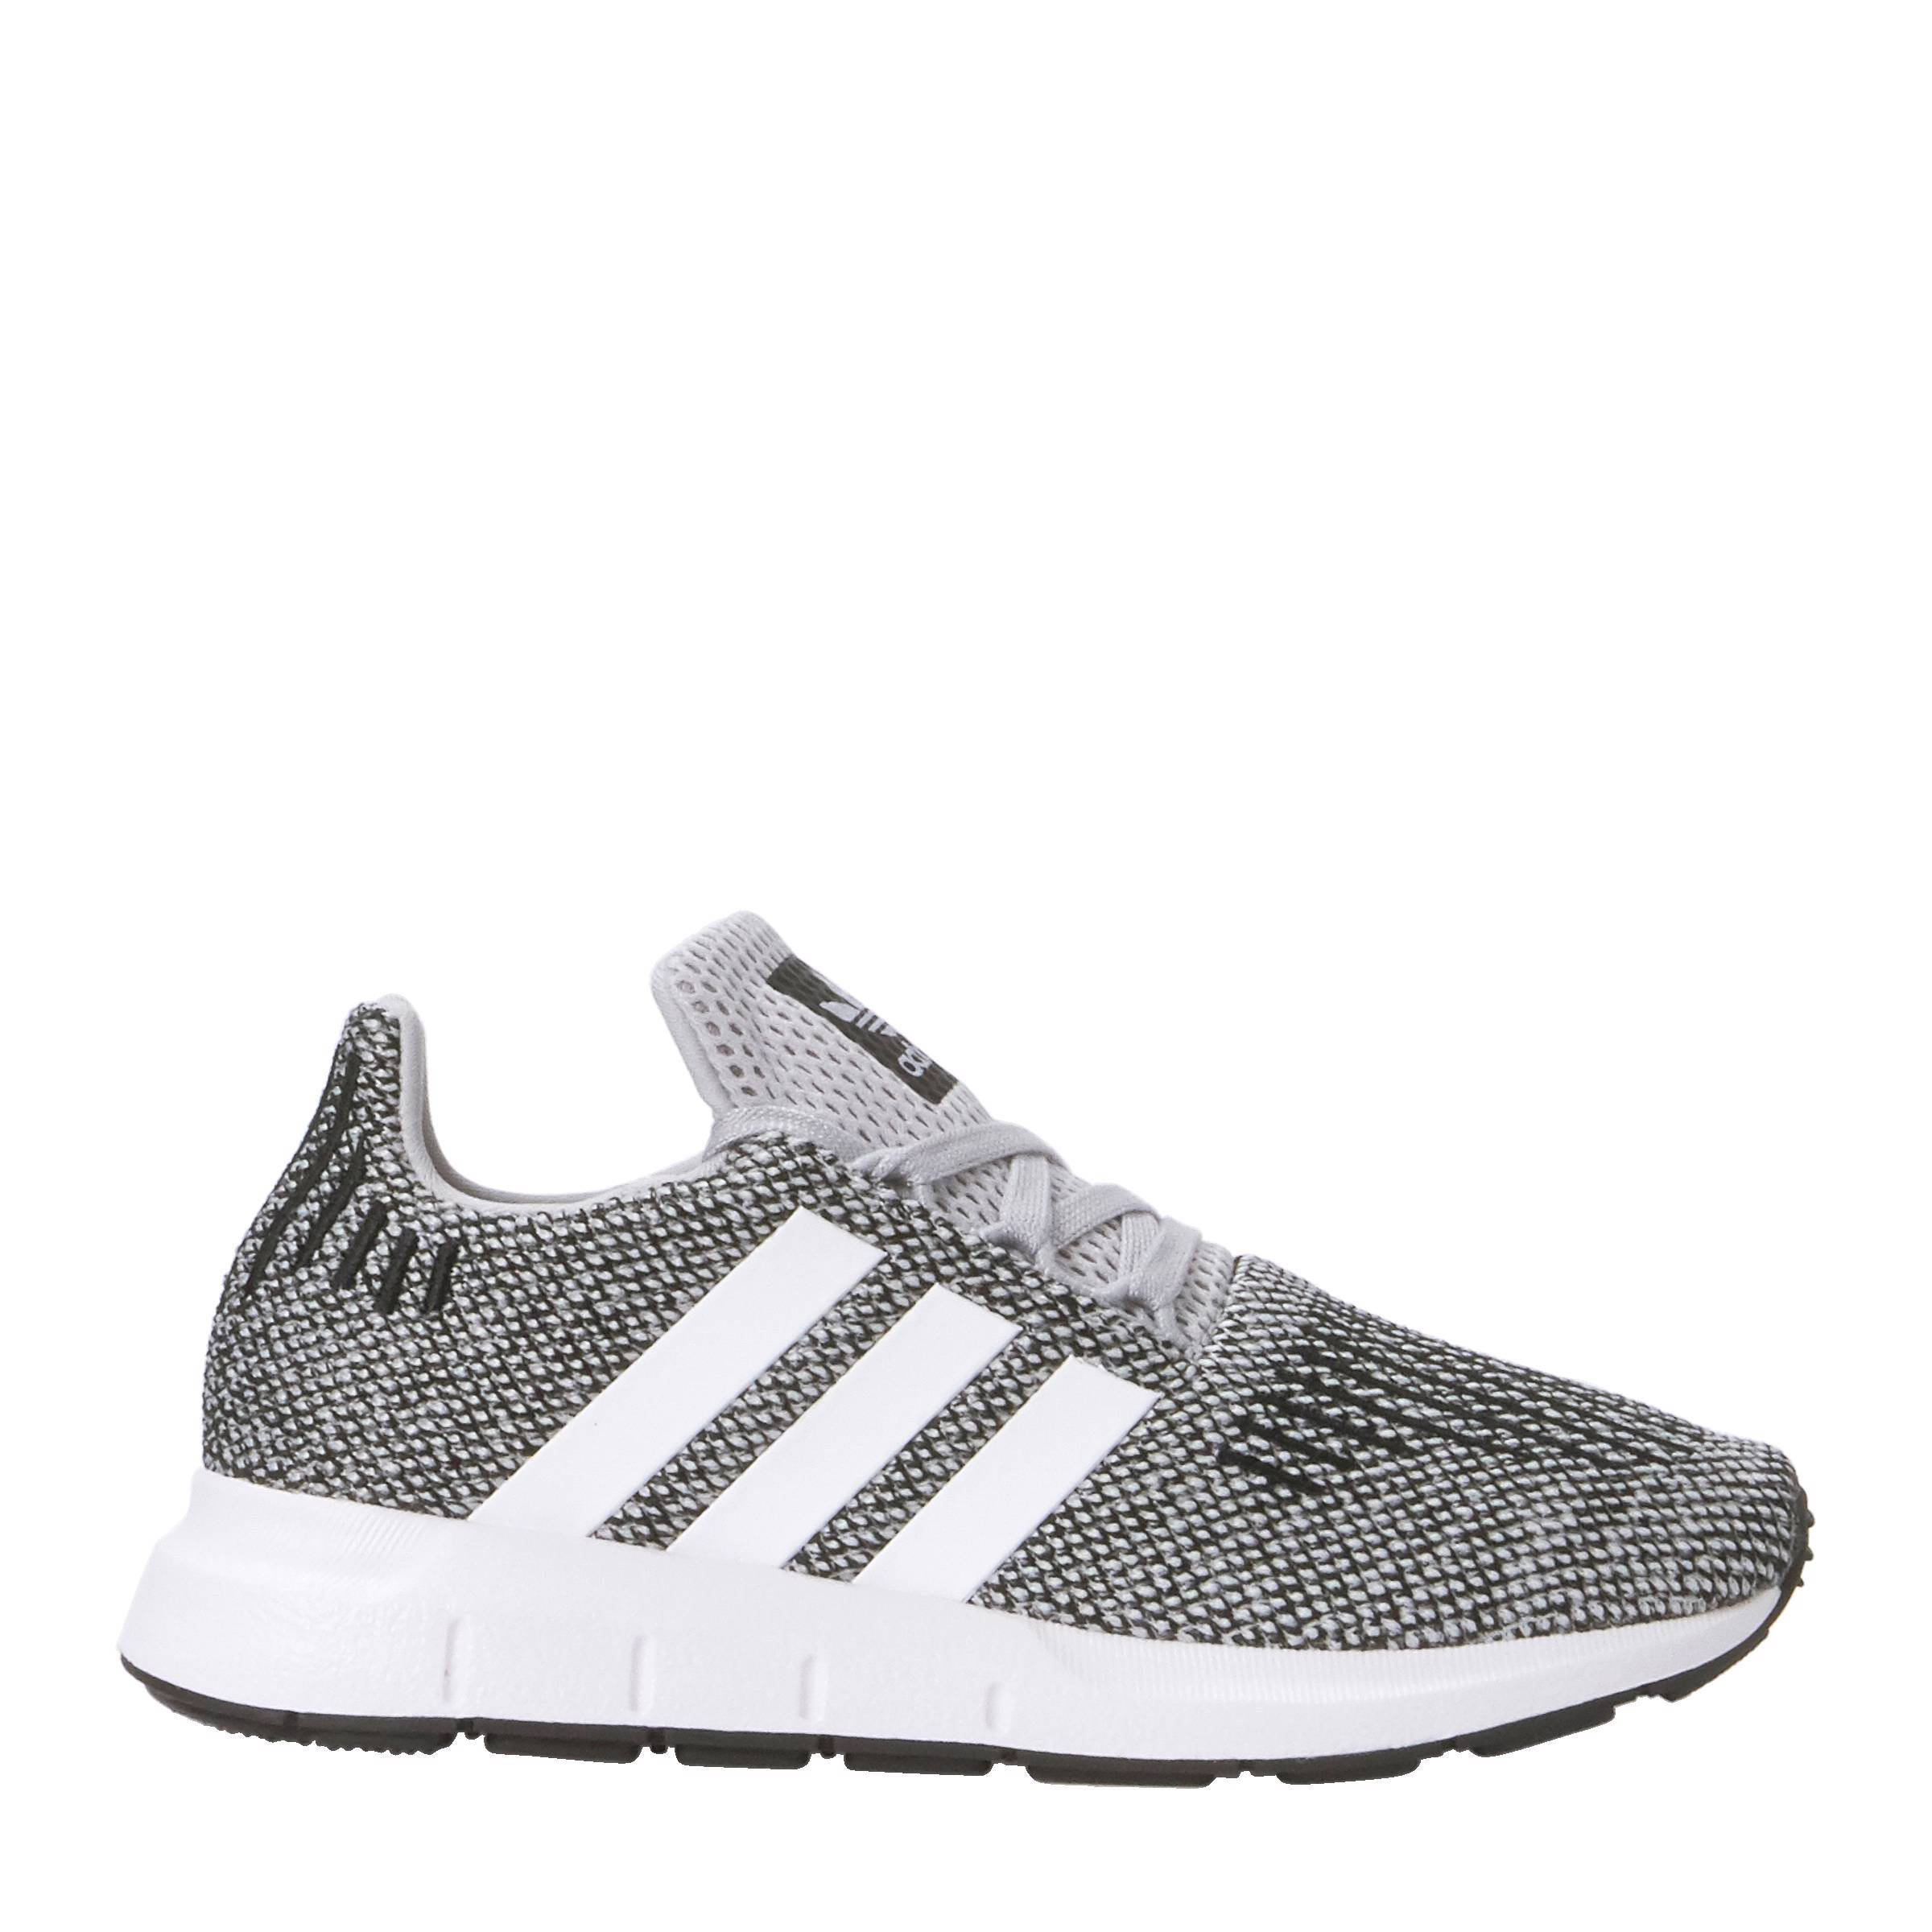 7ad092997f4 adidas originals Swift Run C sneakers | wehkamp